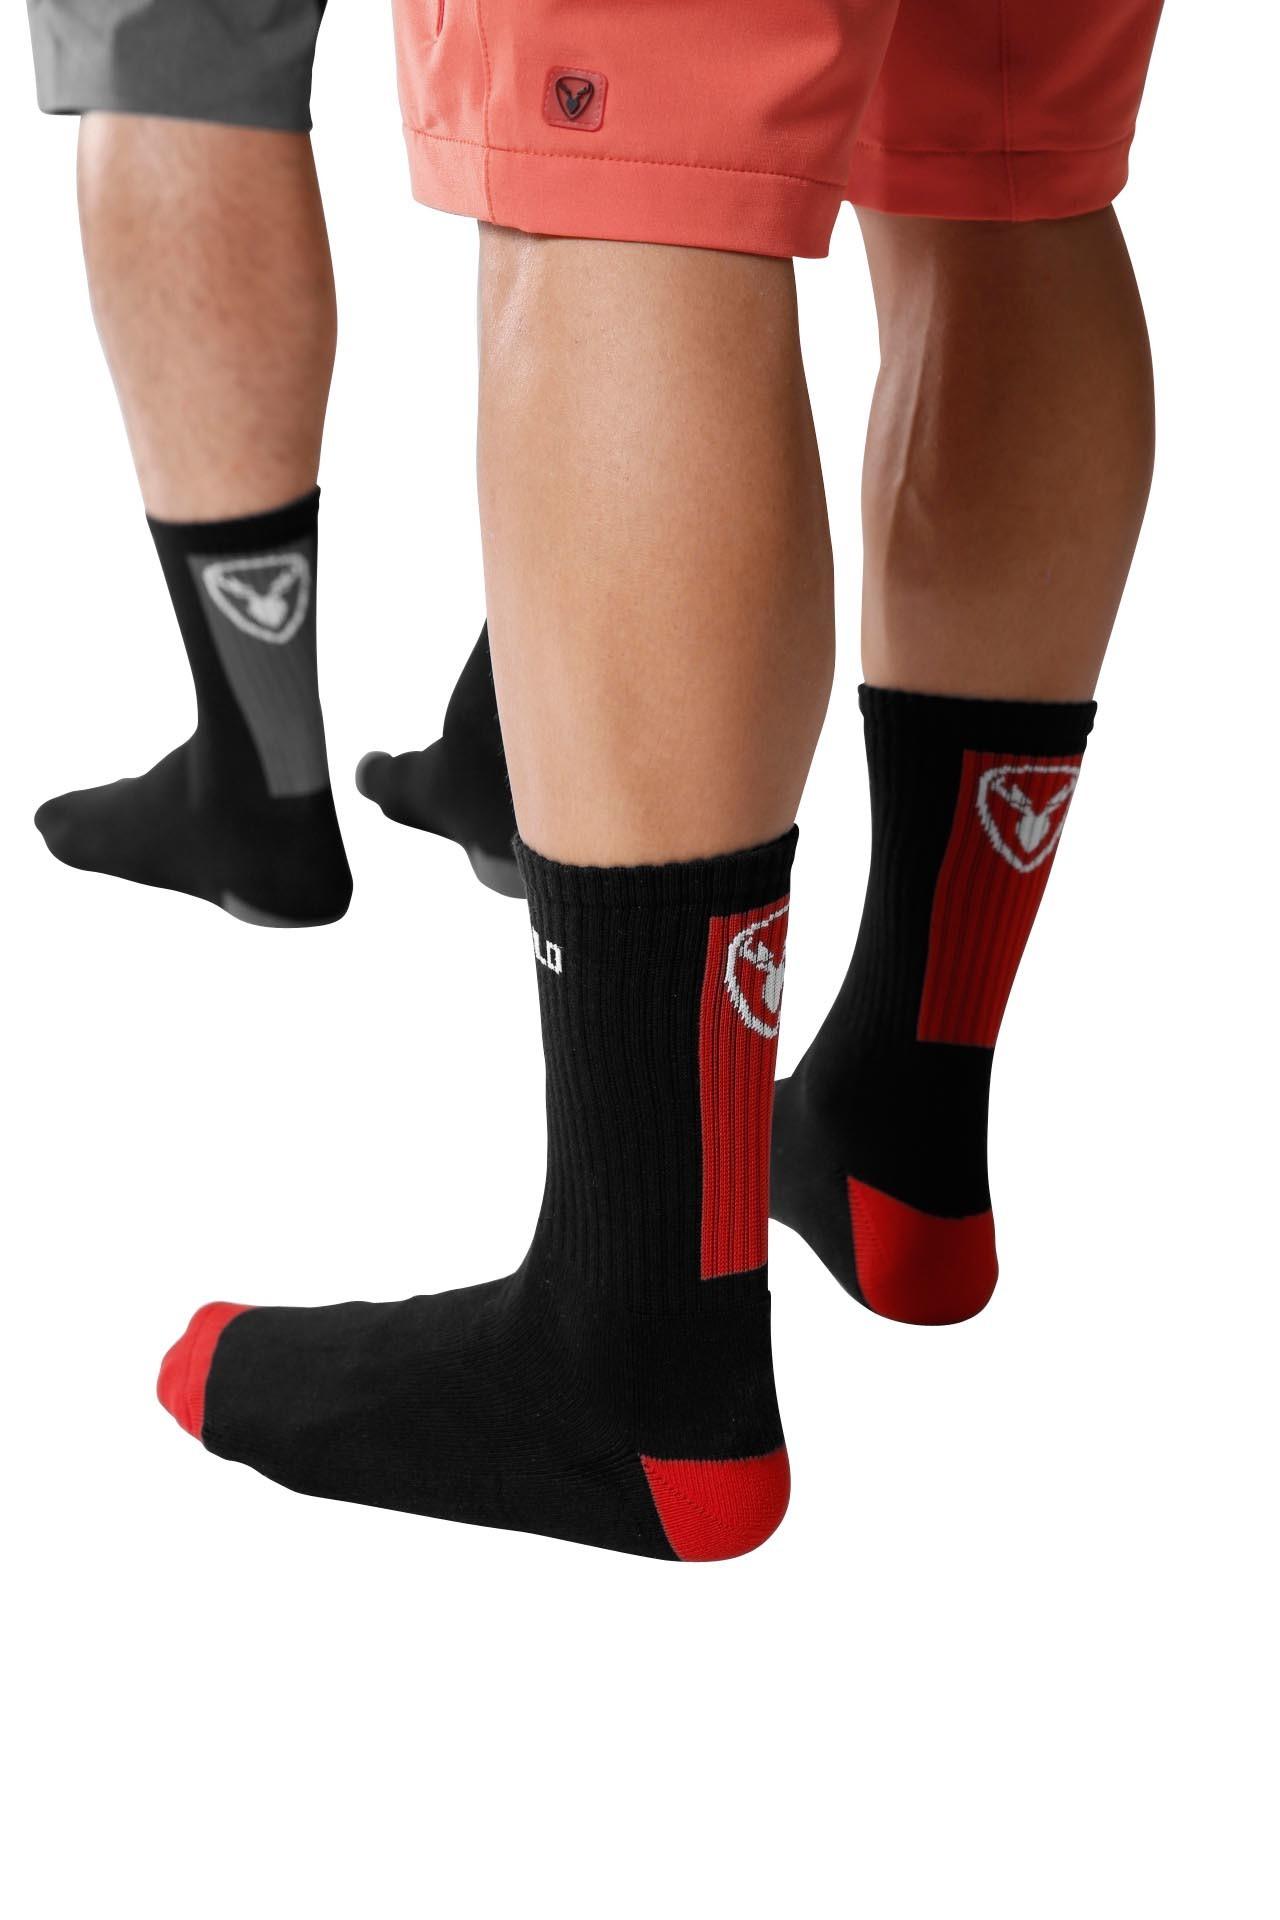 Rotwild Socke high grau